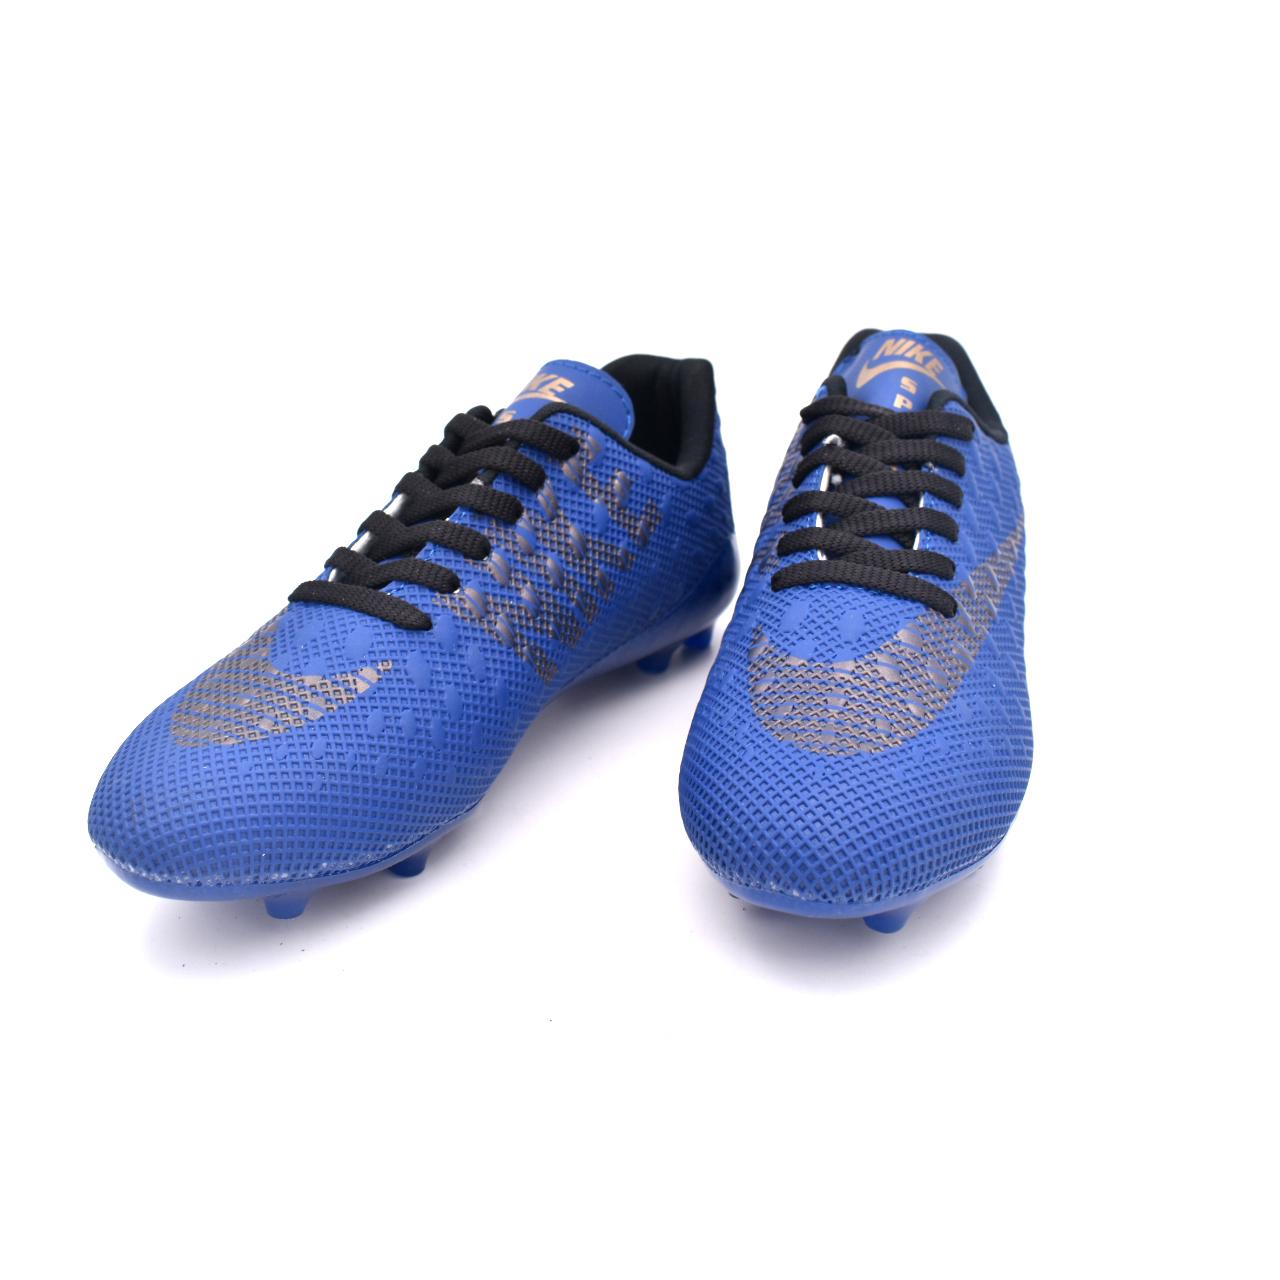 خرید                      کفش فوتبال مردانه کد C-5101